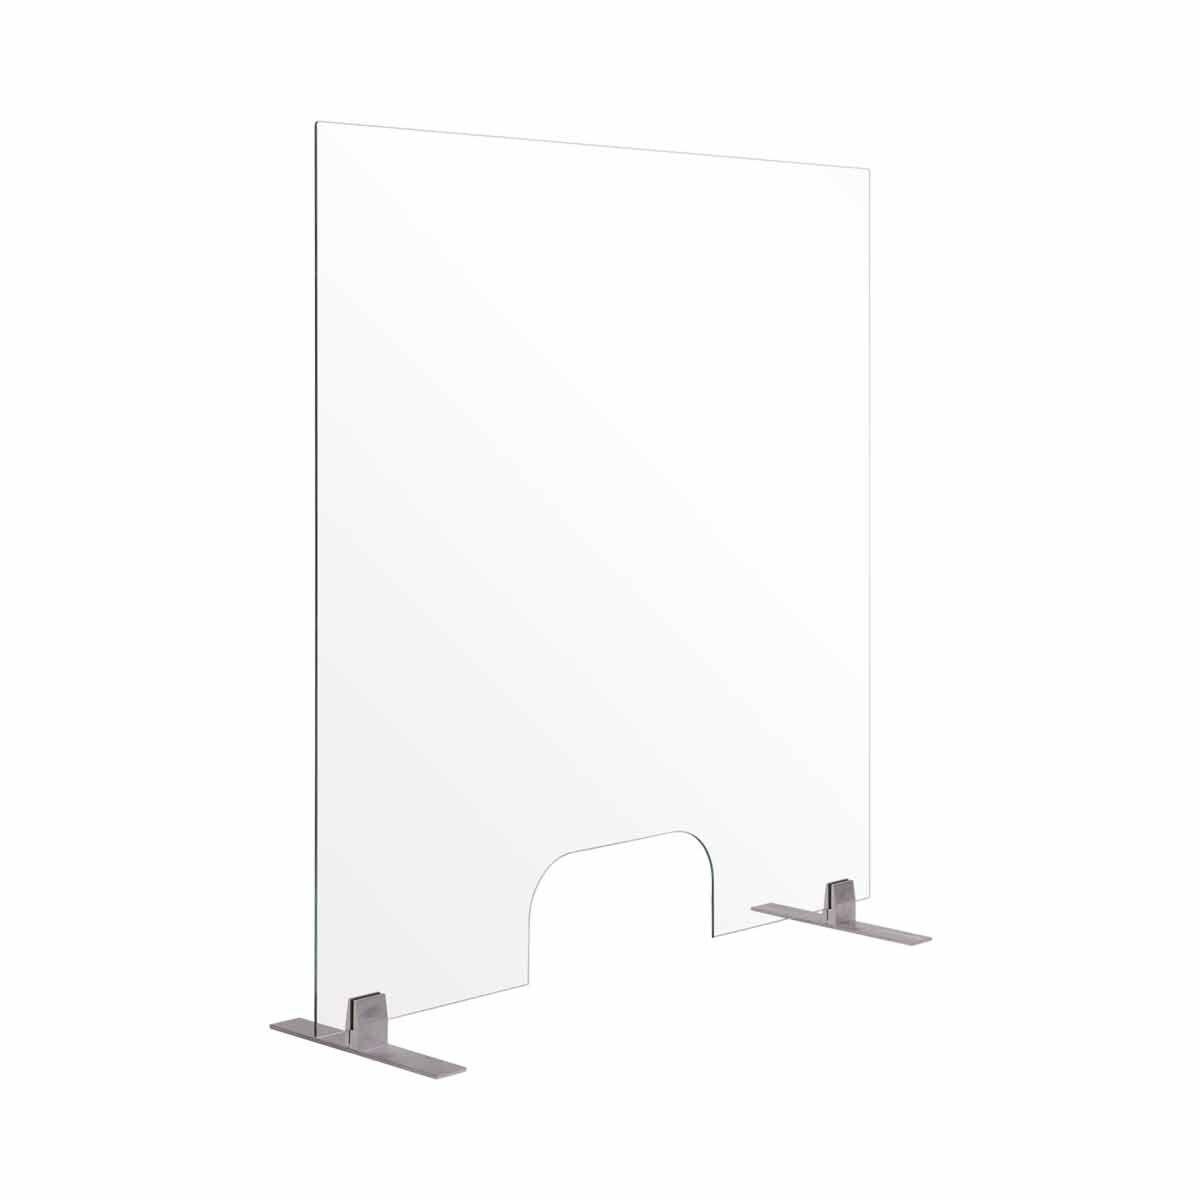 Bi-Office Frameless Counter Protection Screen Glass 120x90 cm